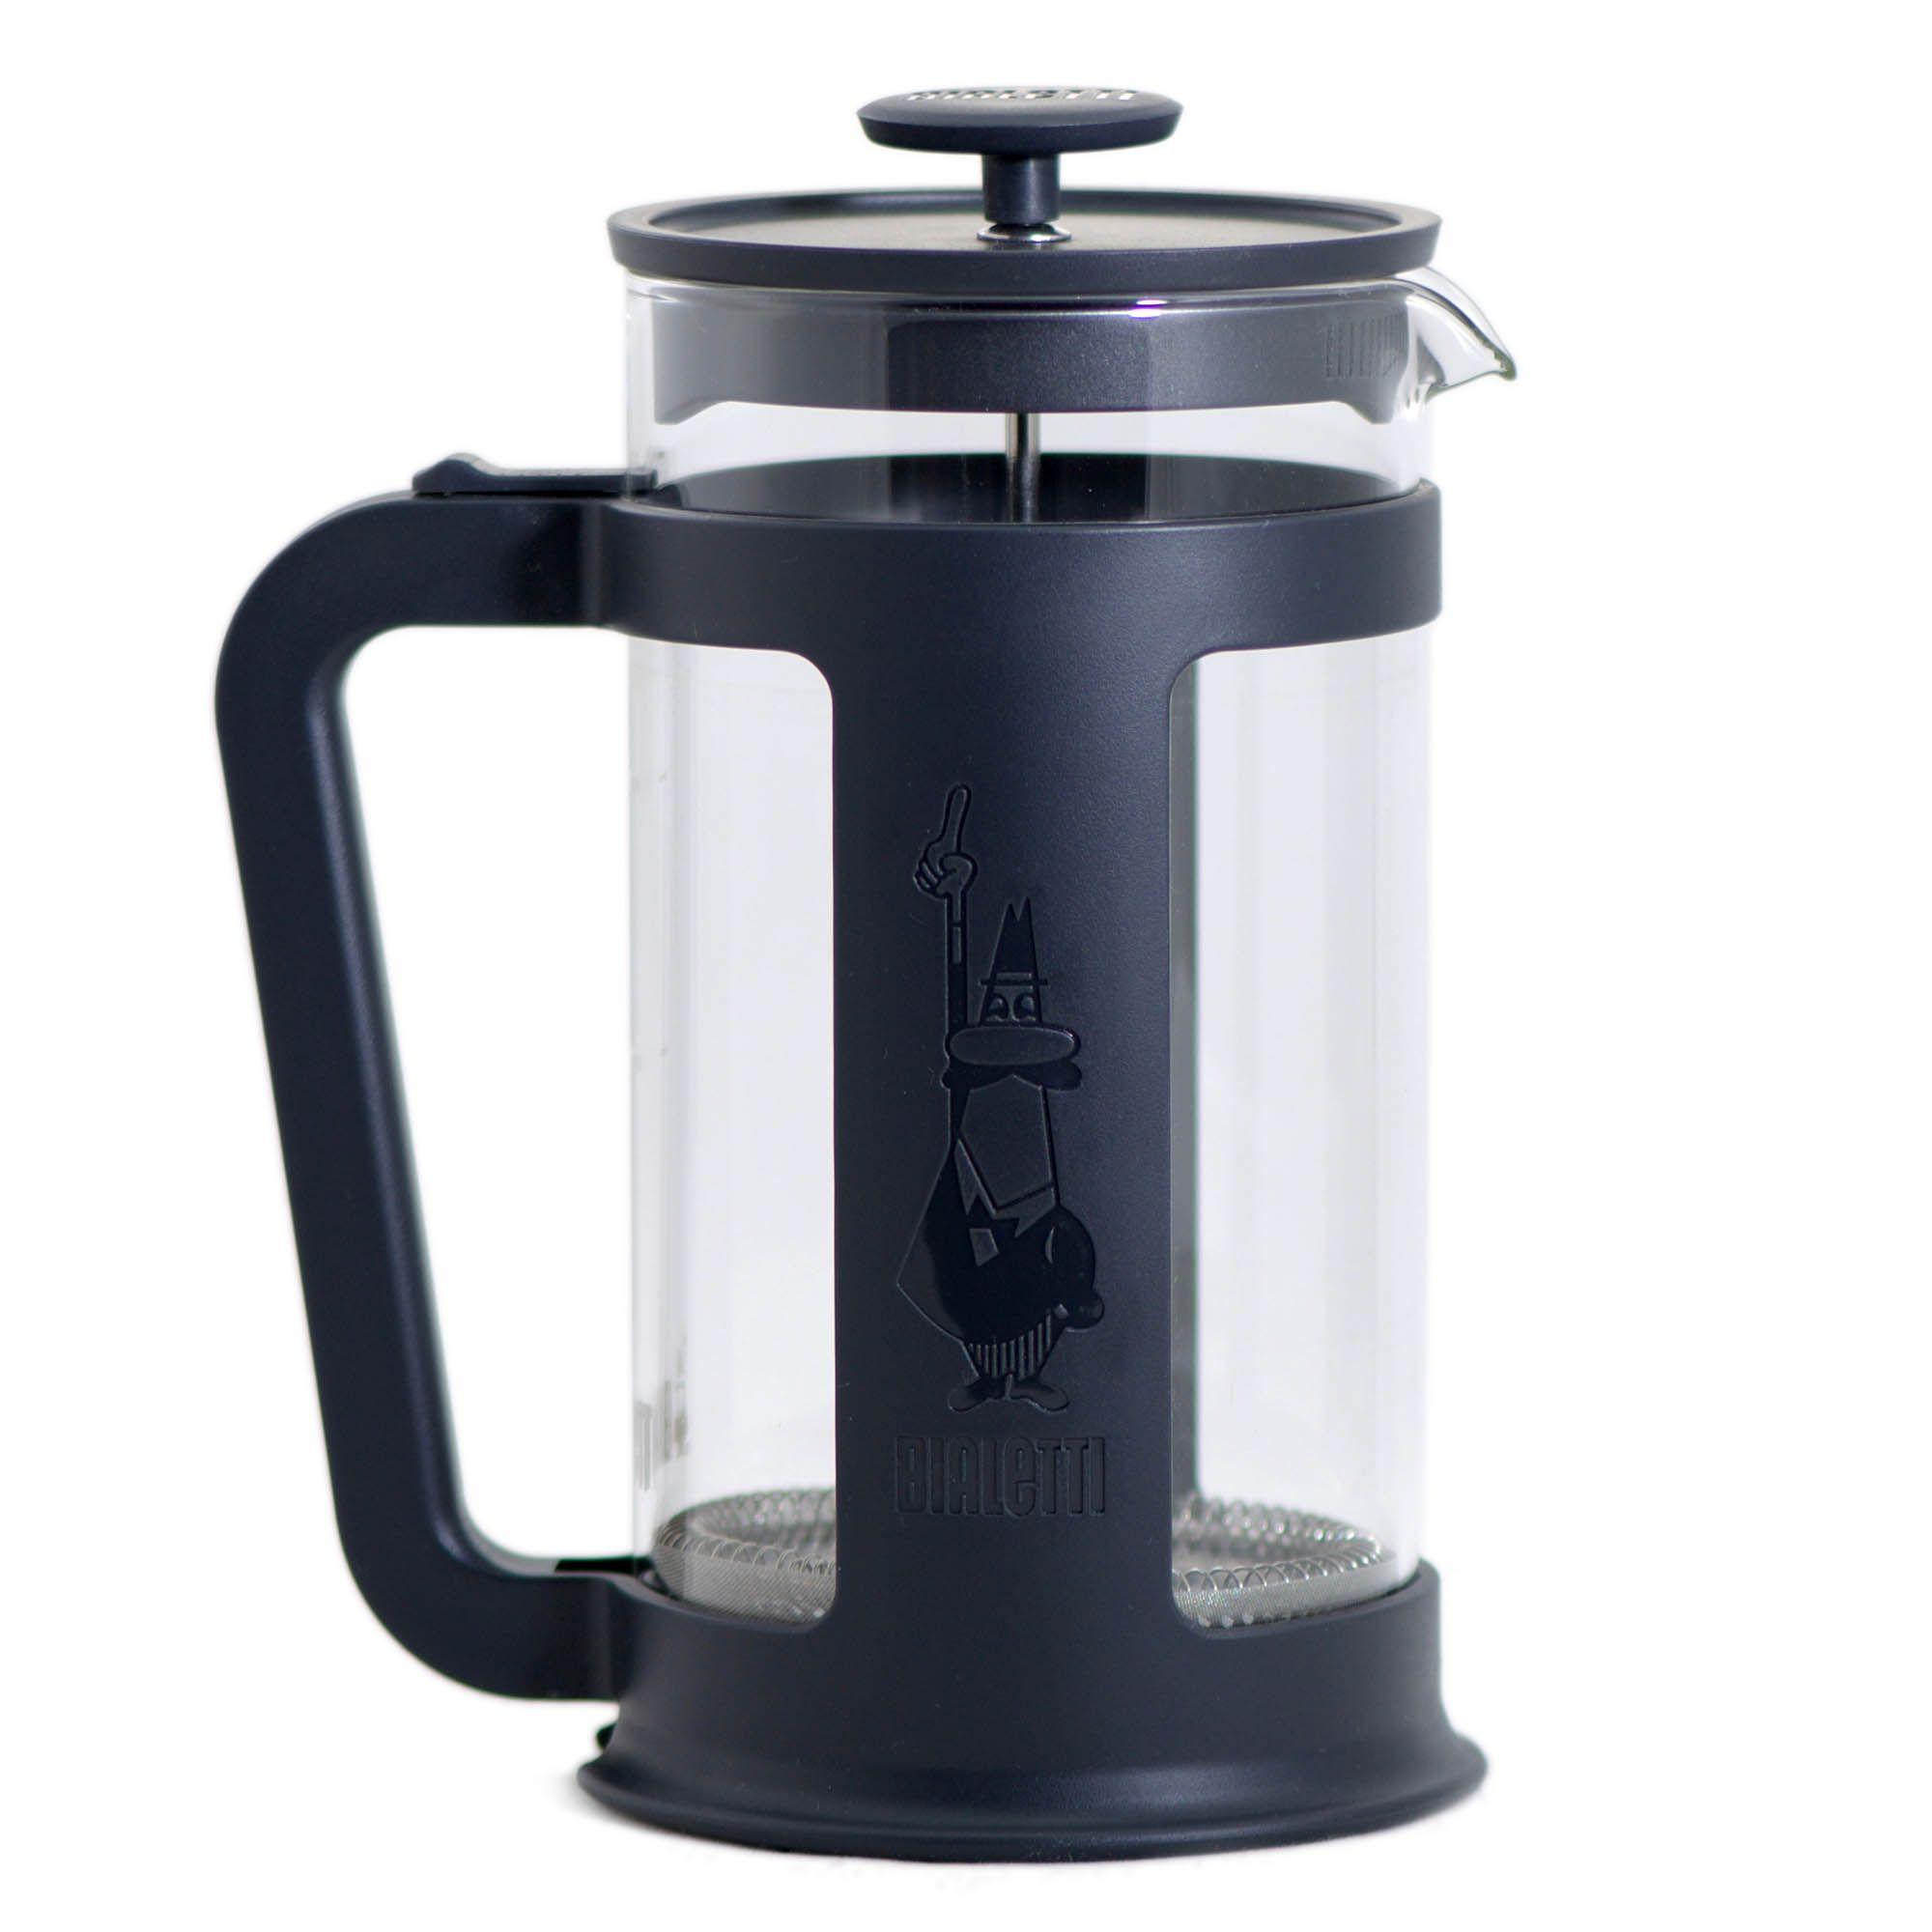 Imeltron - CAFETEIRA FRENCH PRESS 1 L PRETA